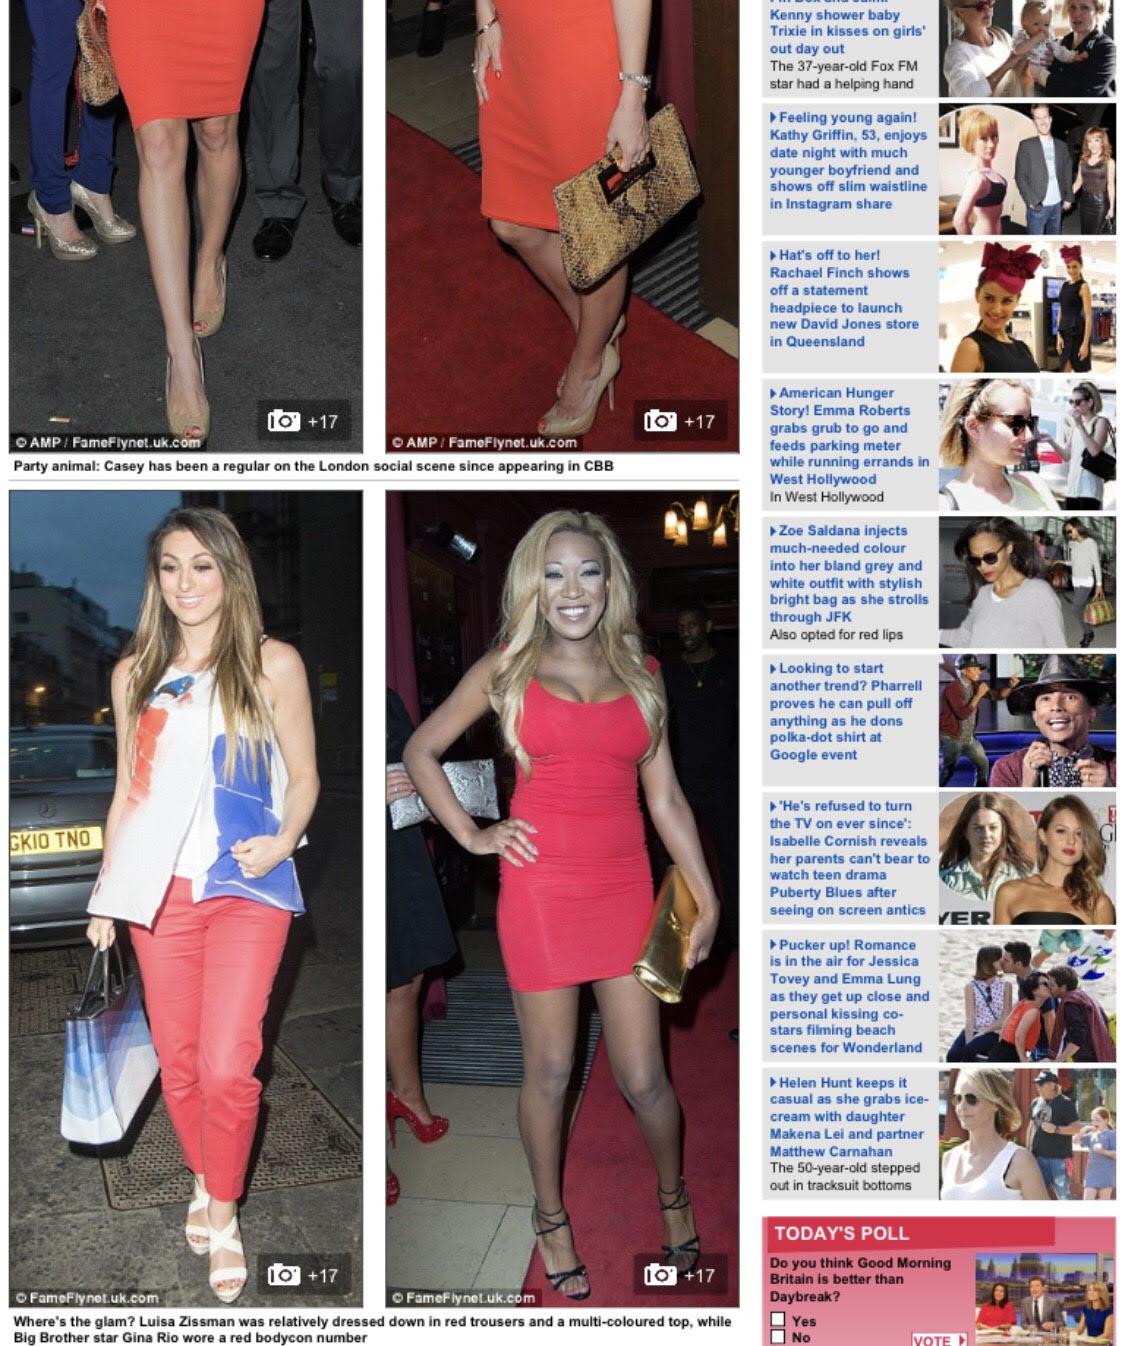 gina rio + luisa zissman + dailymail + georgina rio + press + celebrity + british .jpg